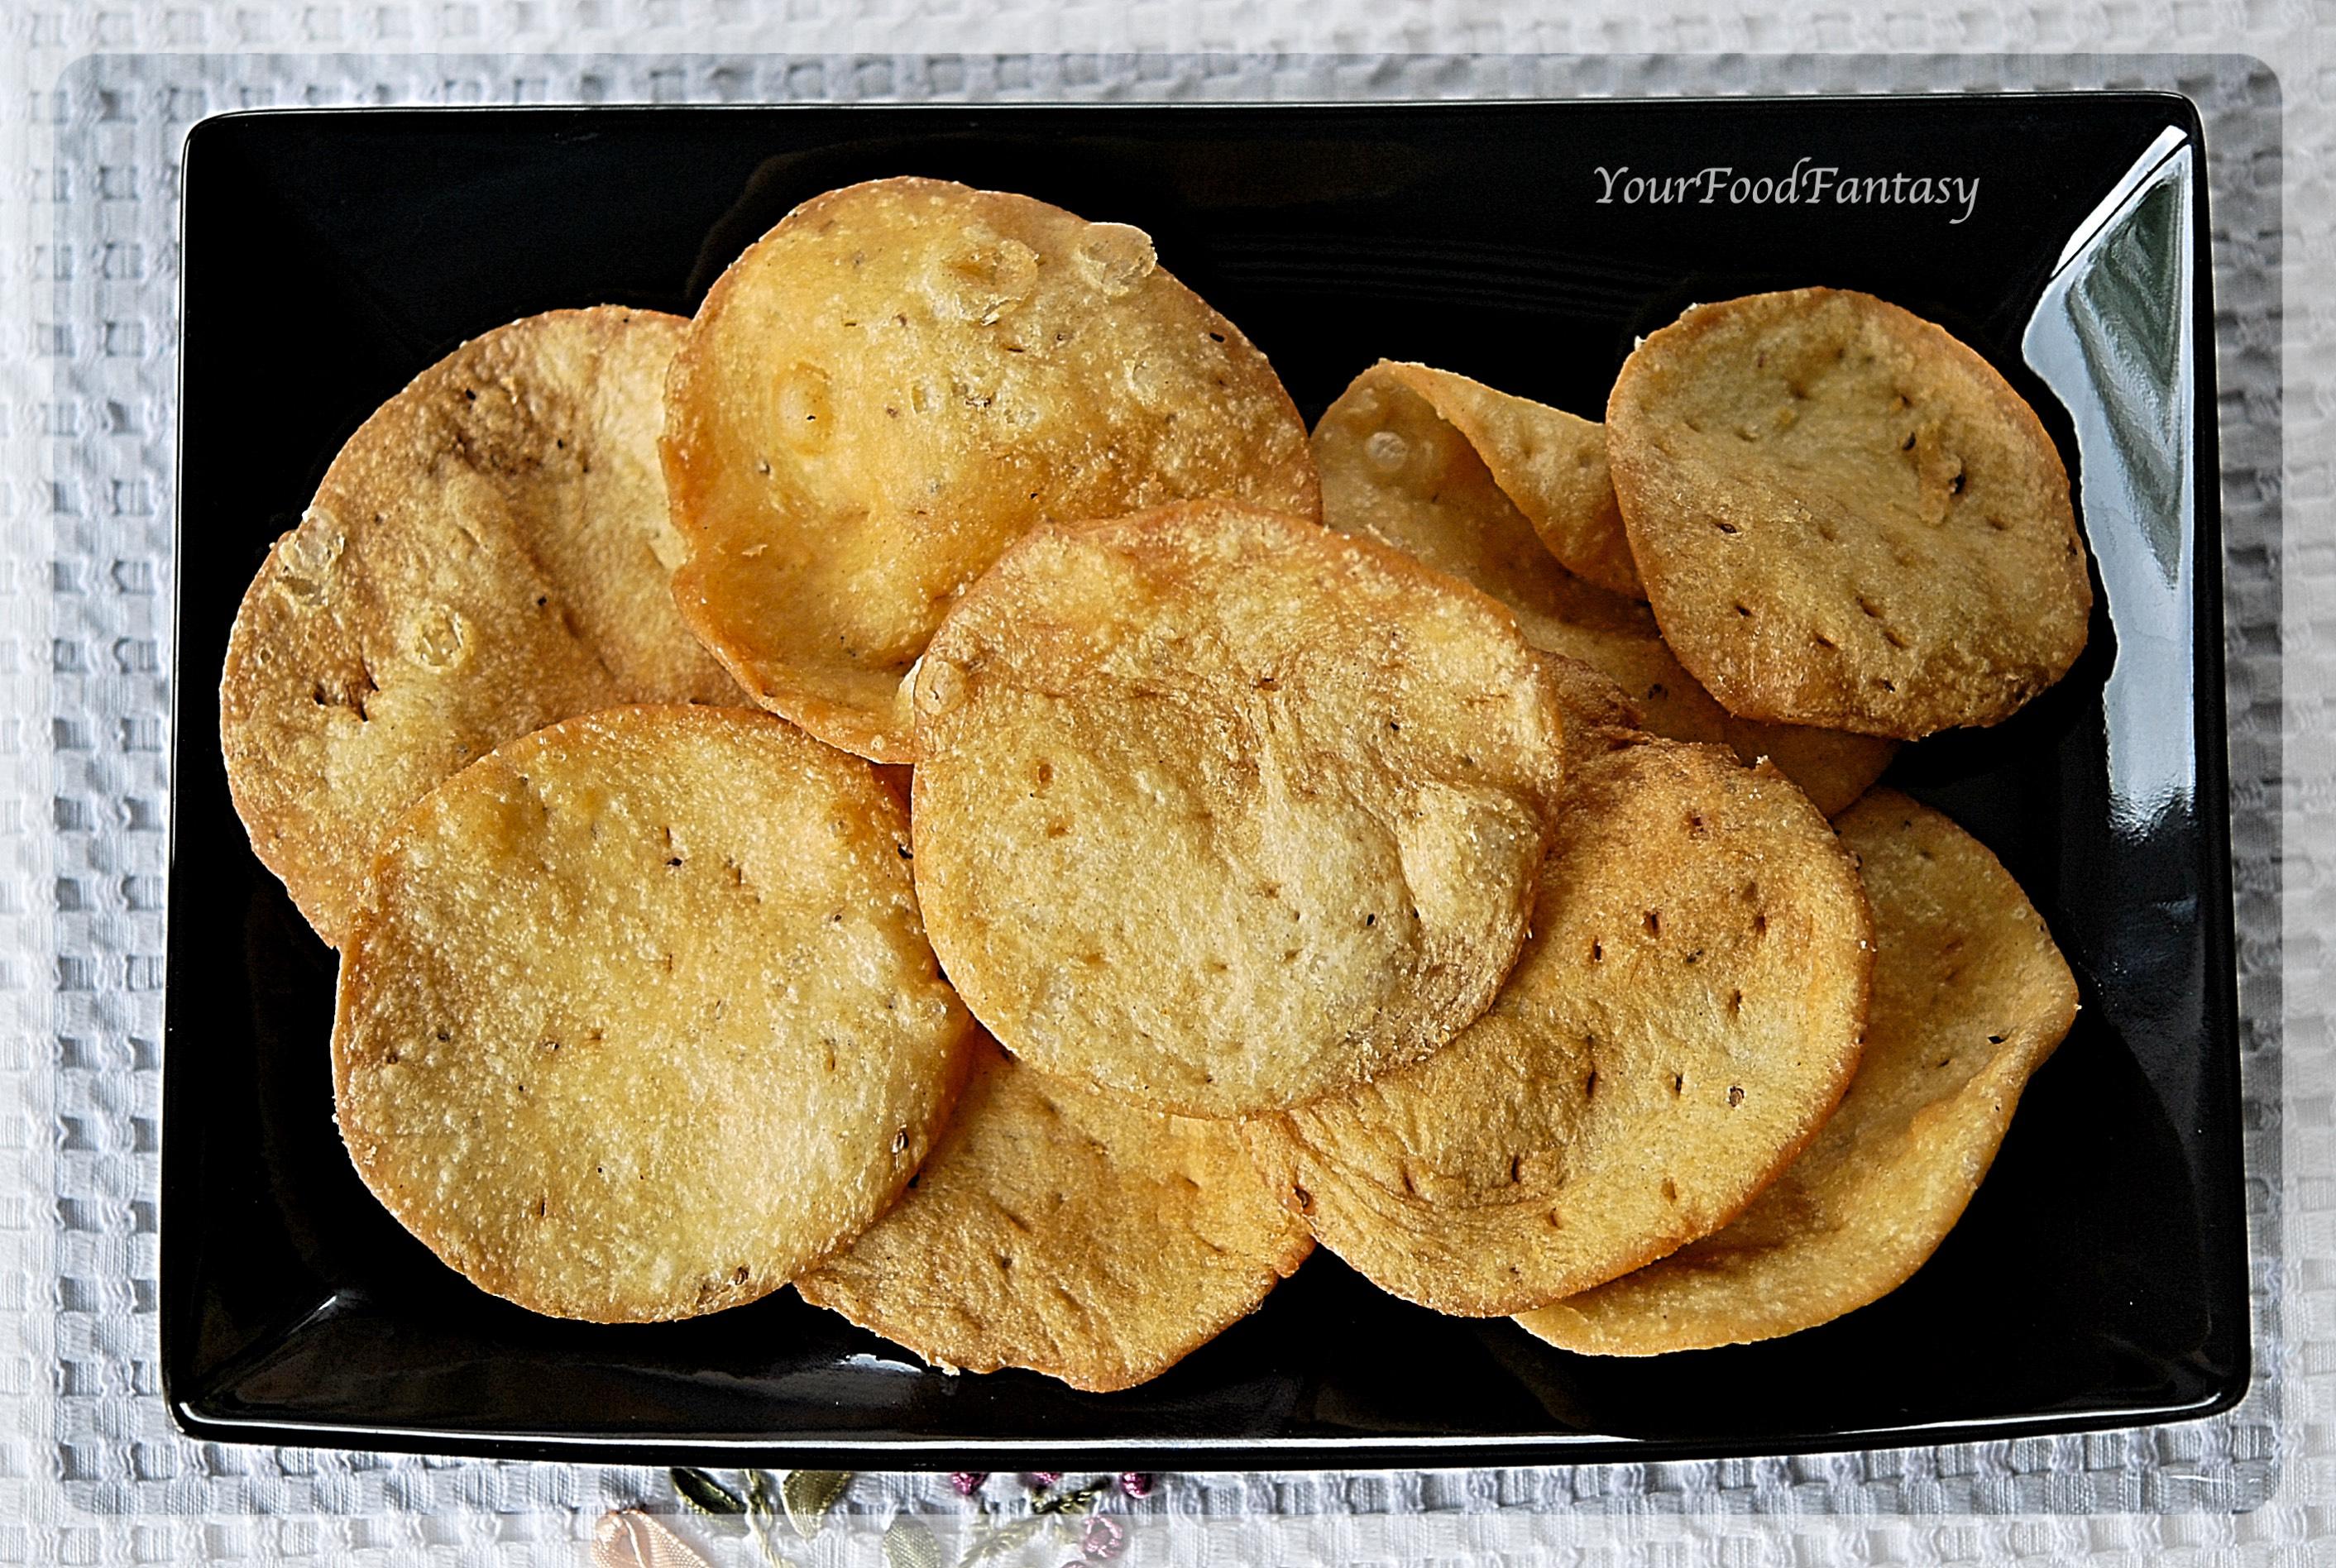 Papdi recipe | Papdi for Papdi Chaat | Your Food Fantasy by Meenu Gupta